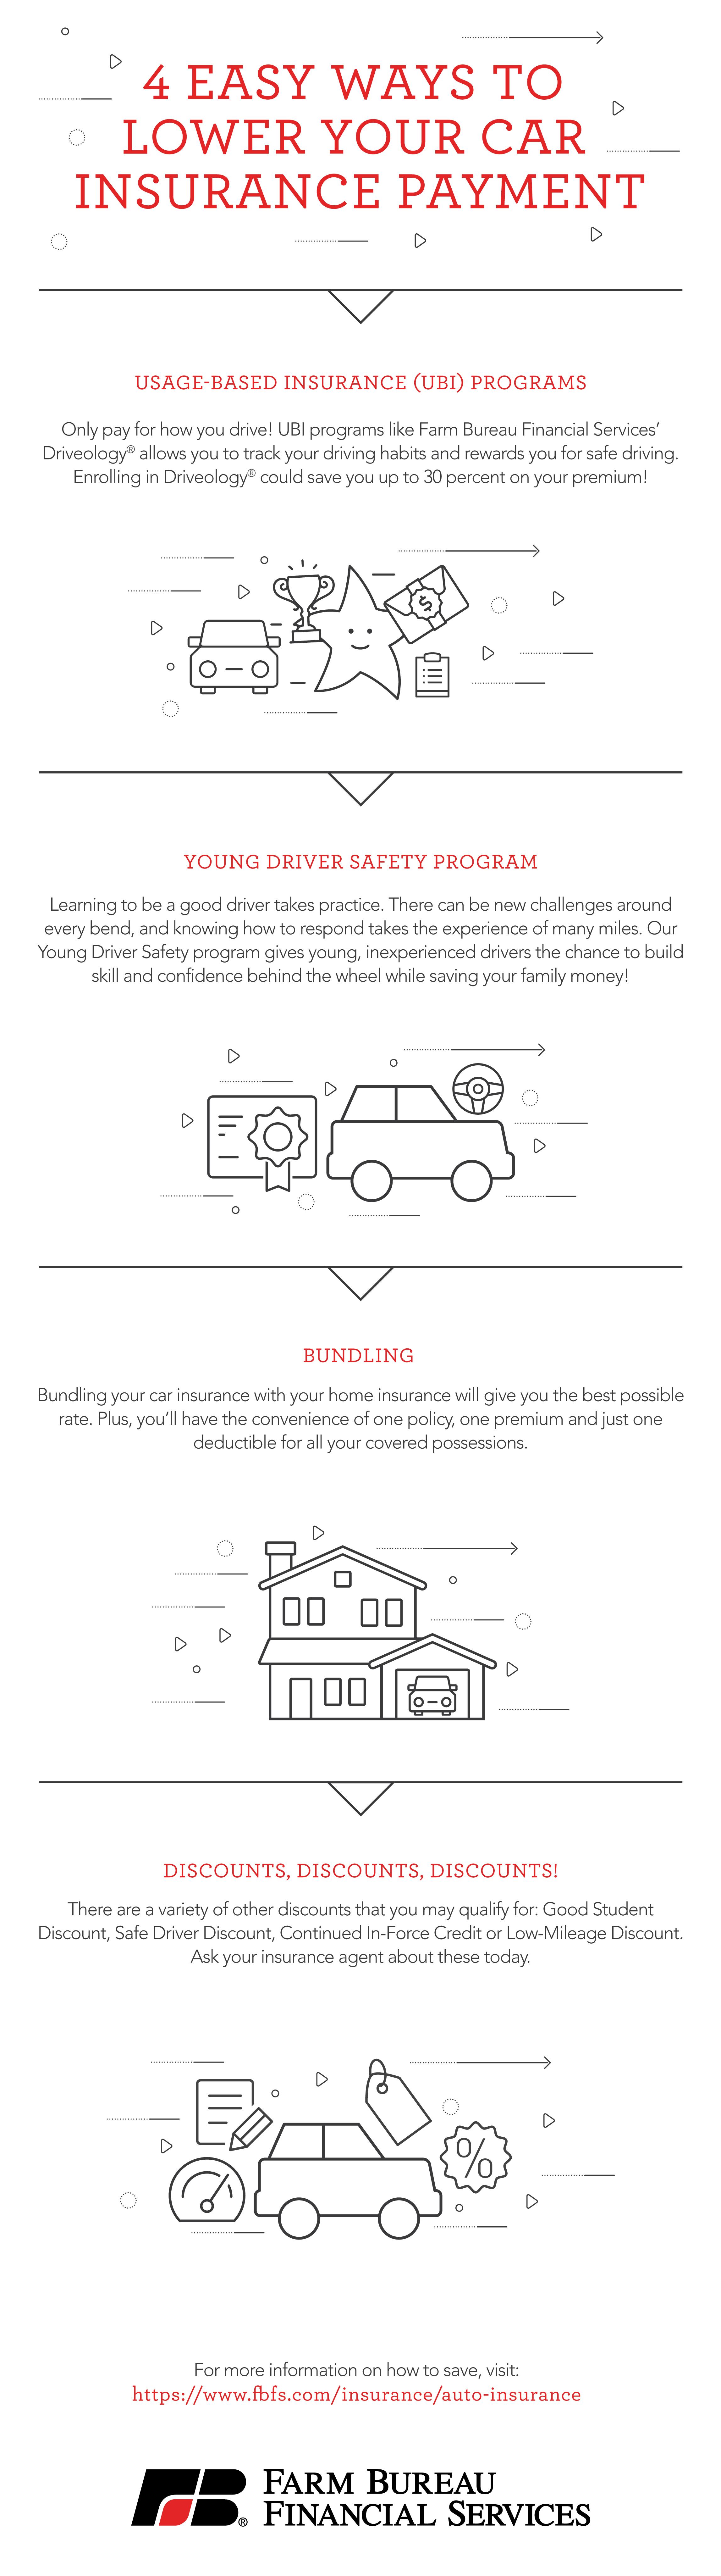 4 Easy Ways to Lower Your Car Insurance Payment Farm Bureau